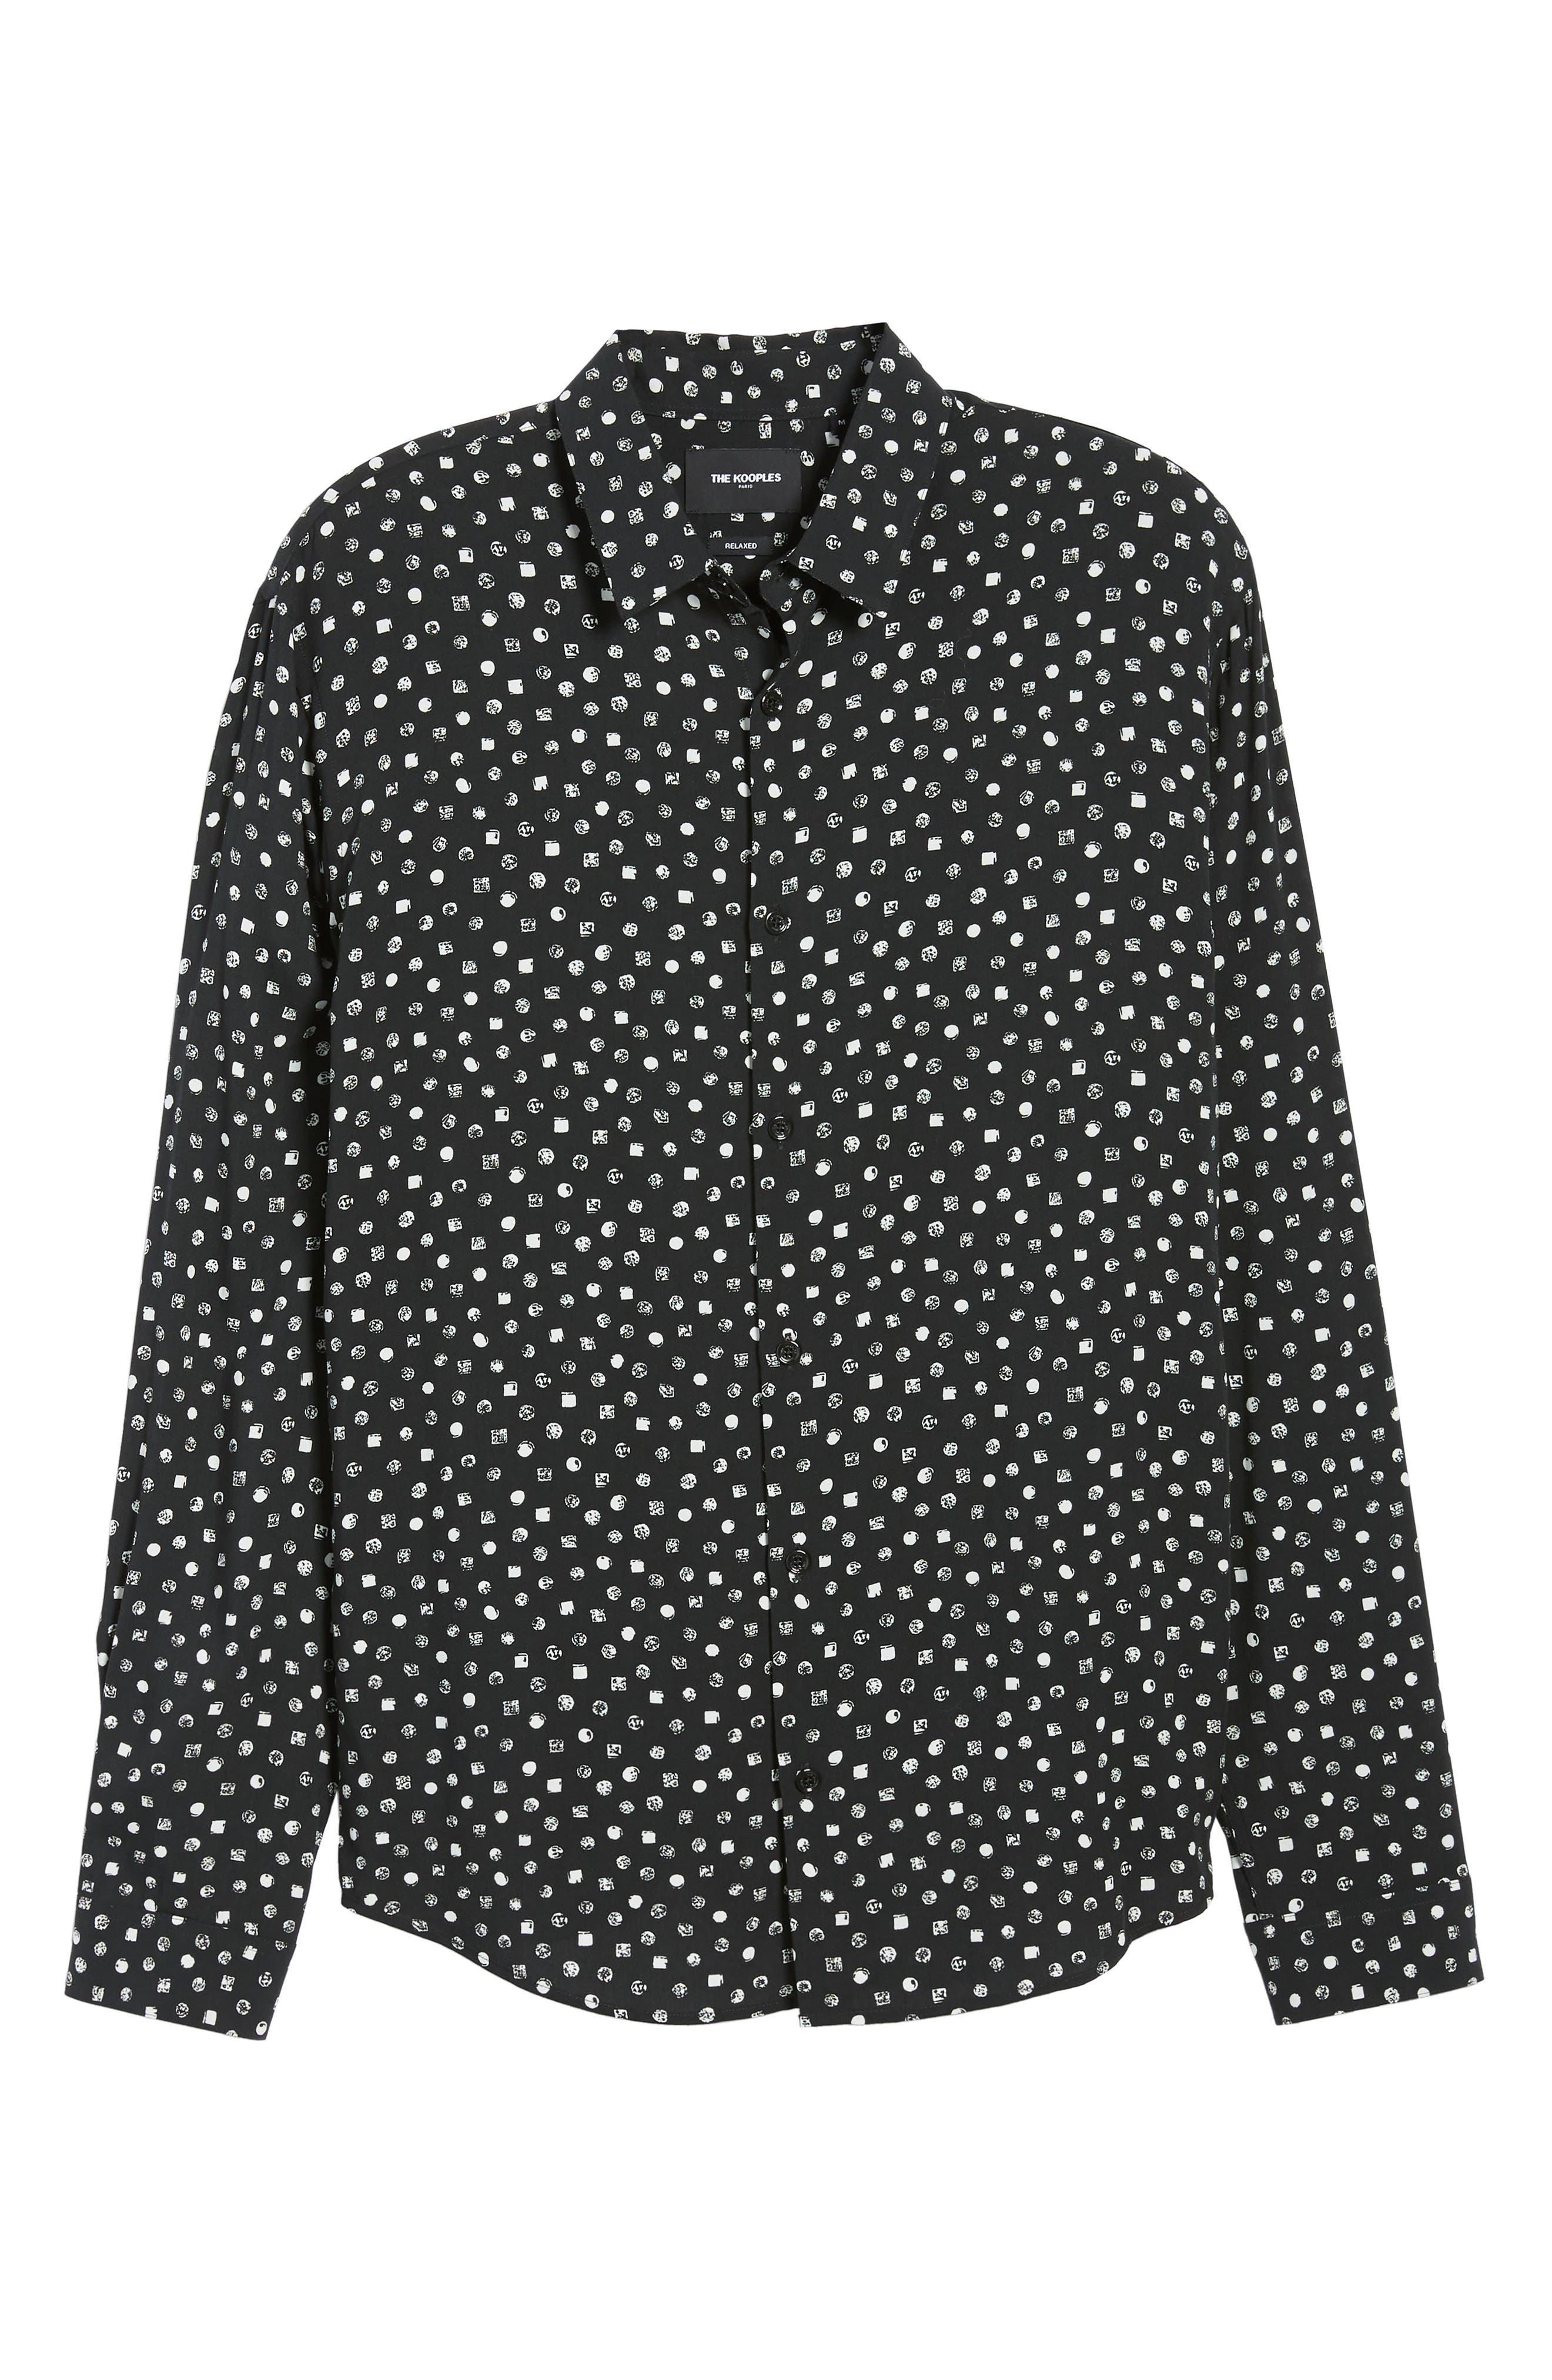 THE KOOPLES, Classic Fit Print Sport Shirt, Alternate thumbnail 5, color, BLACK WHITE